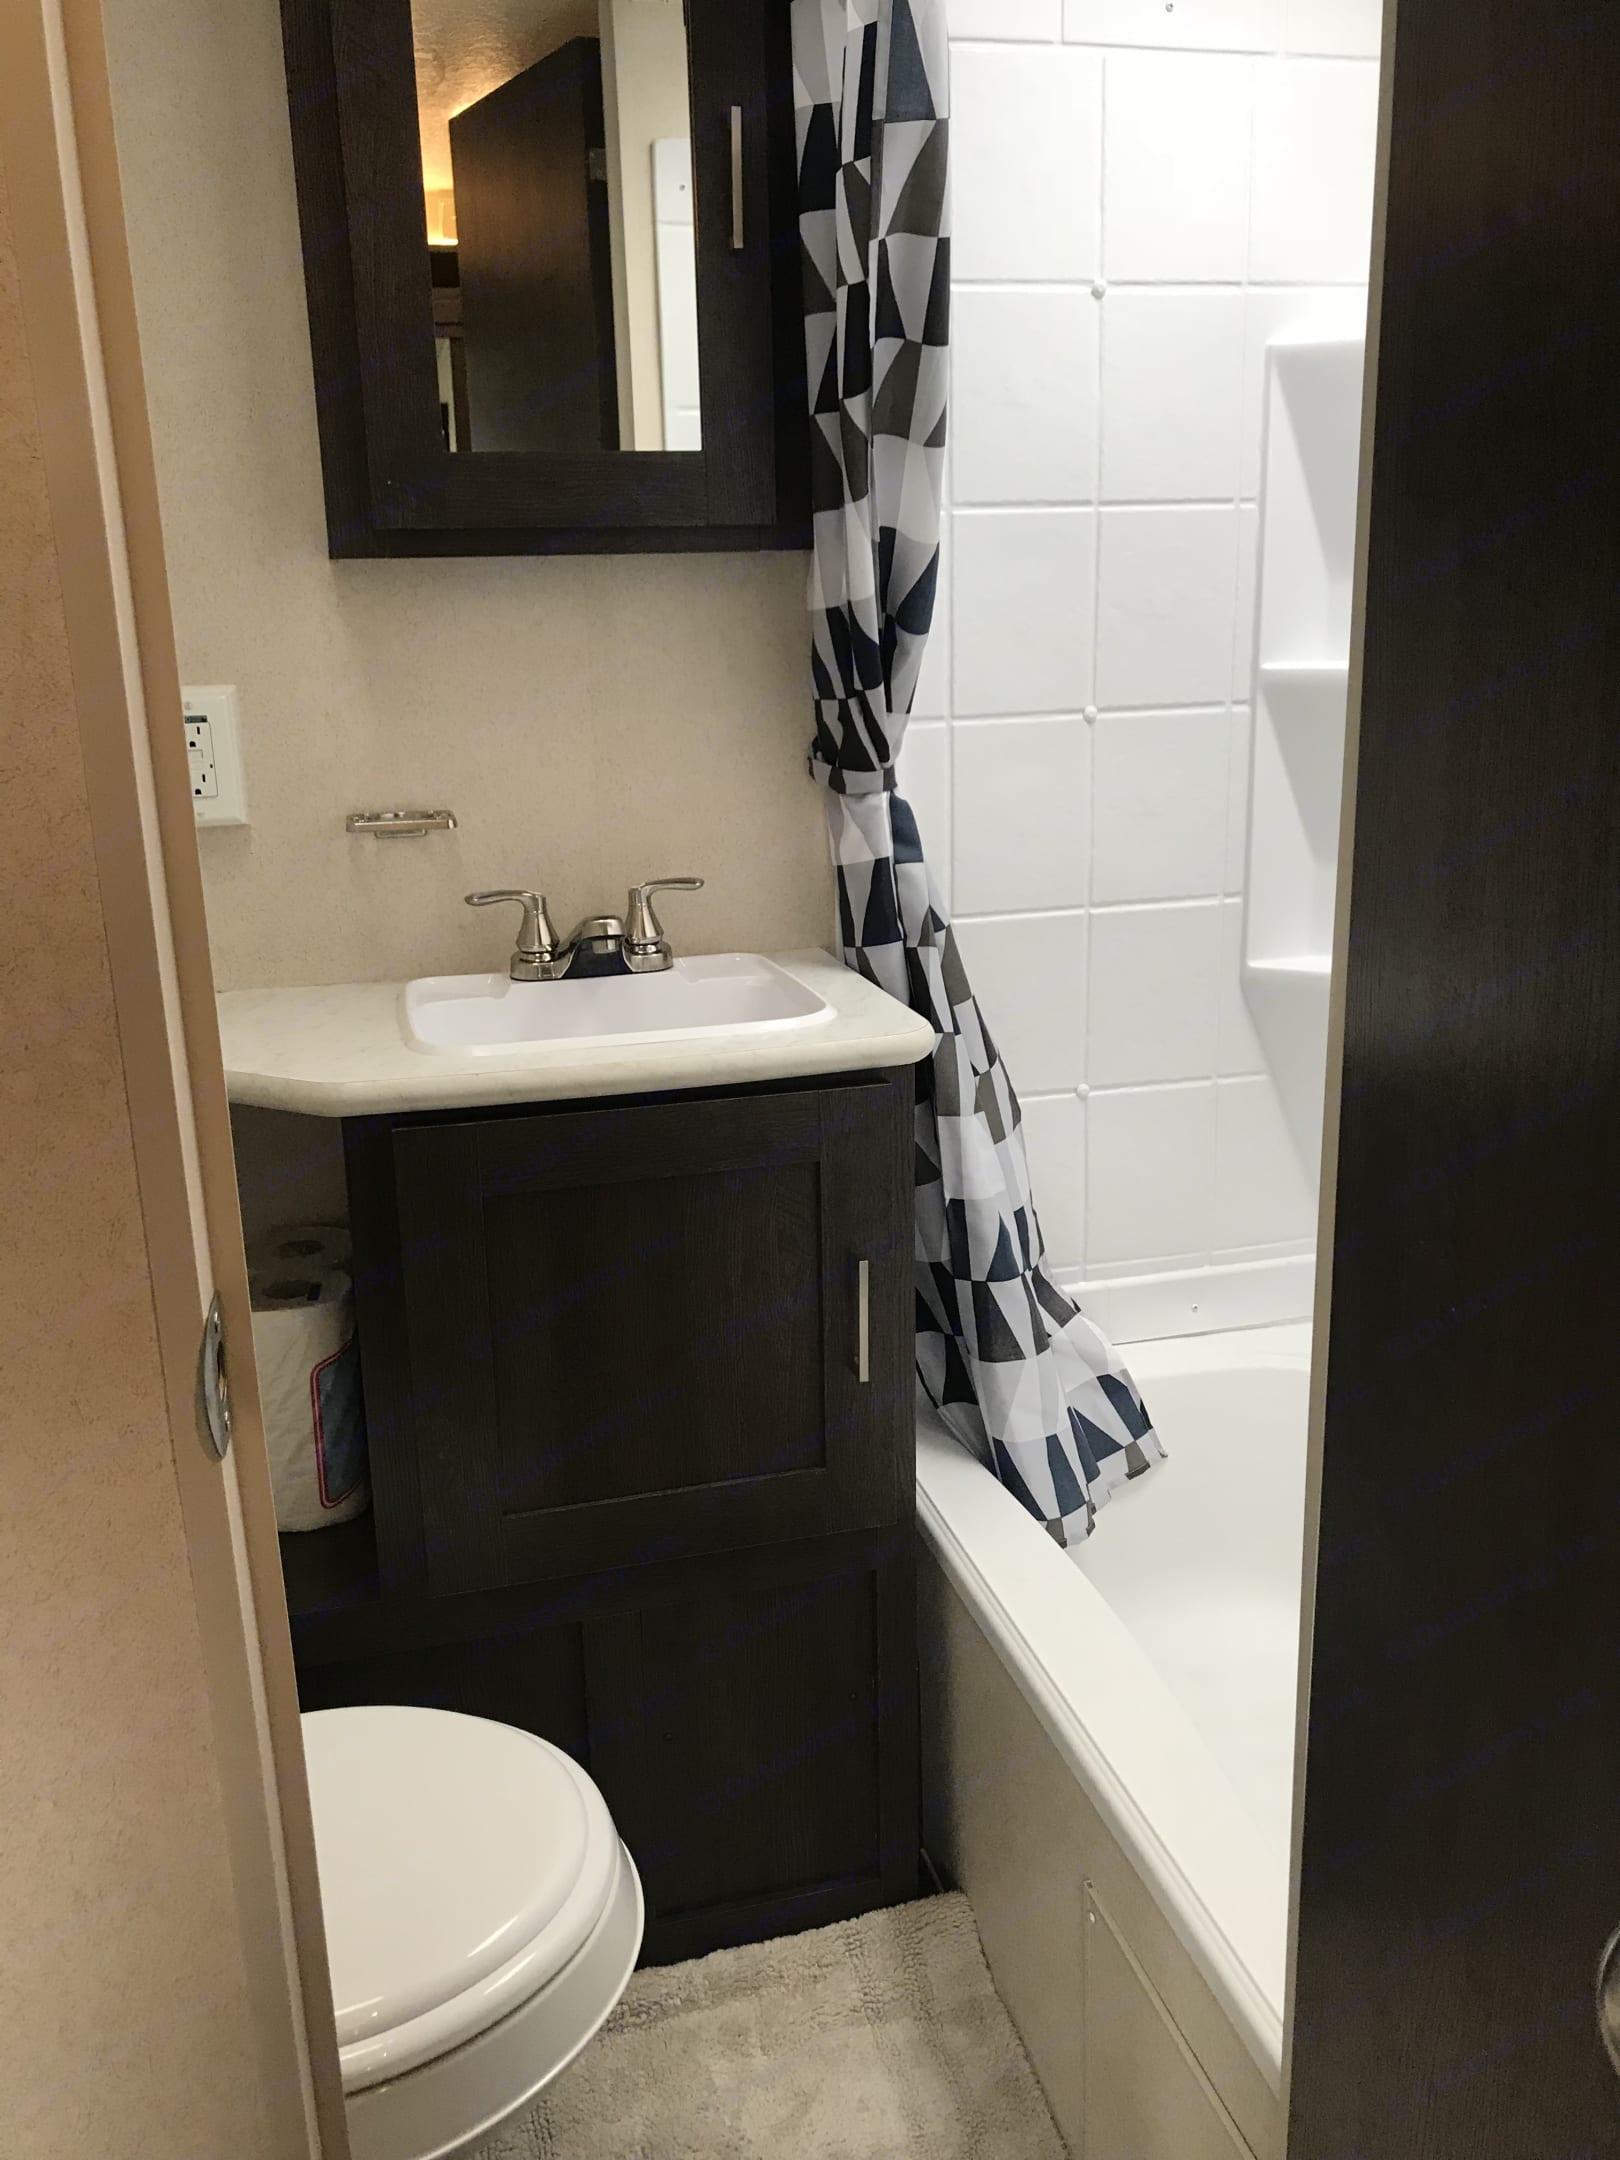 Bathroom. Forest River Wildwood 2019